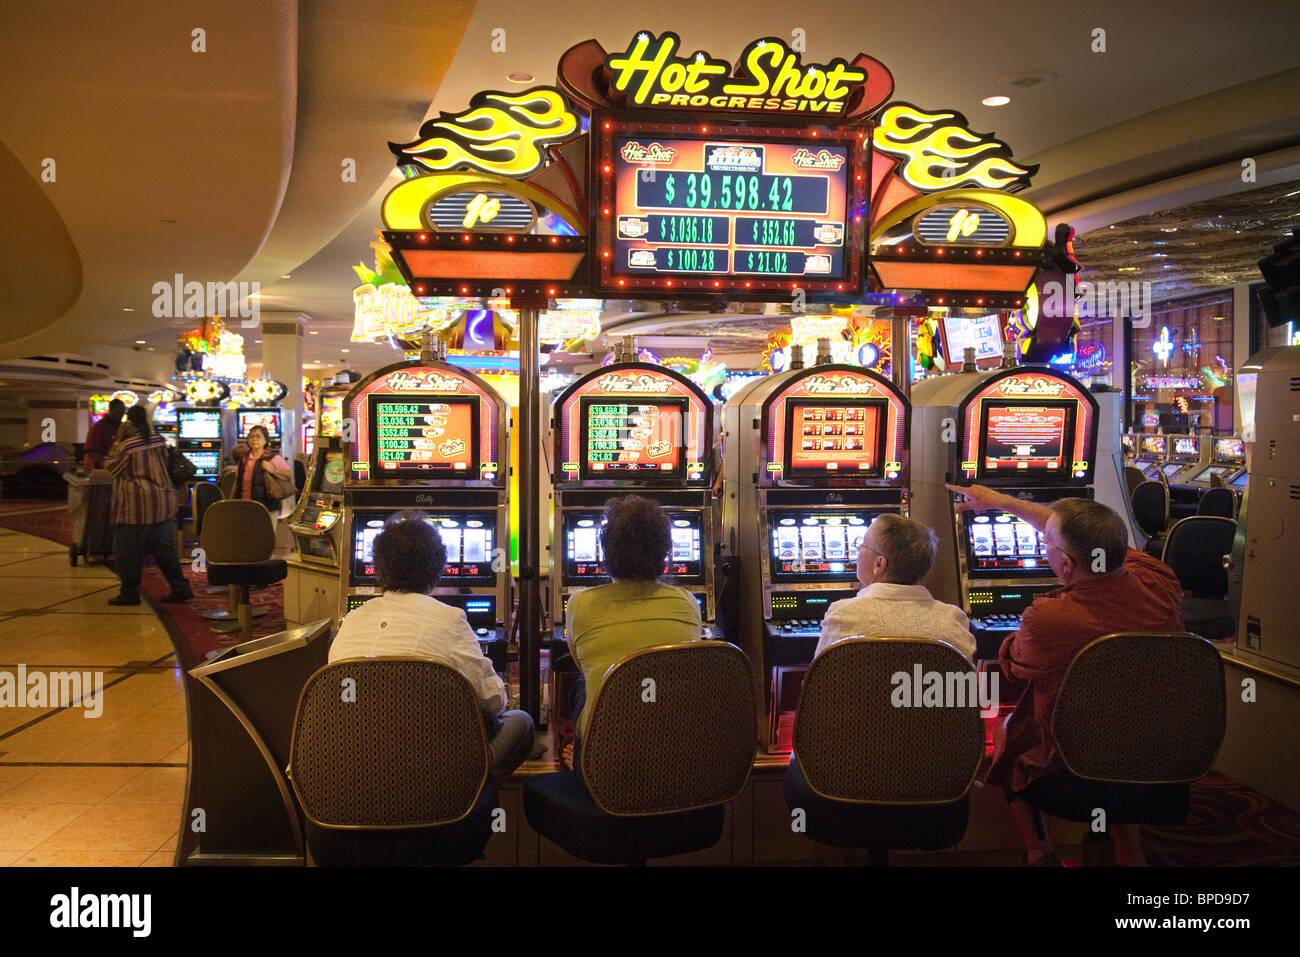 Gamblers trying their luck on the slot machines, Harrah's Casino, Las Vegas, Nevada, USA - Stock Image